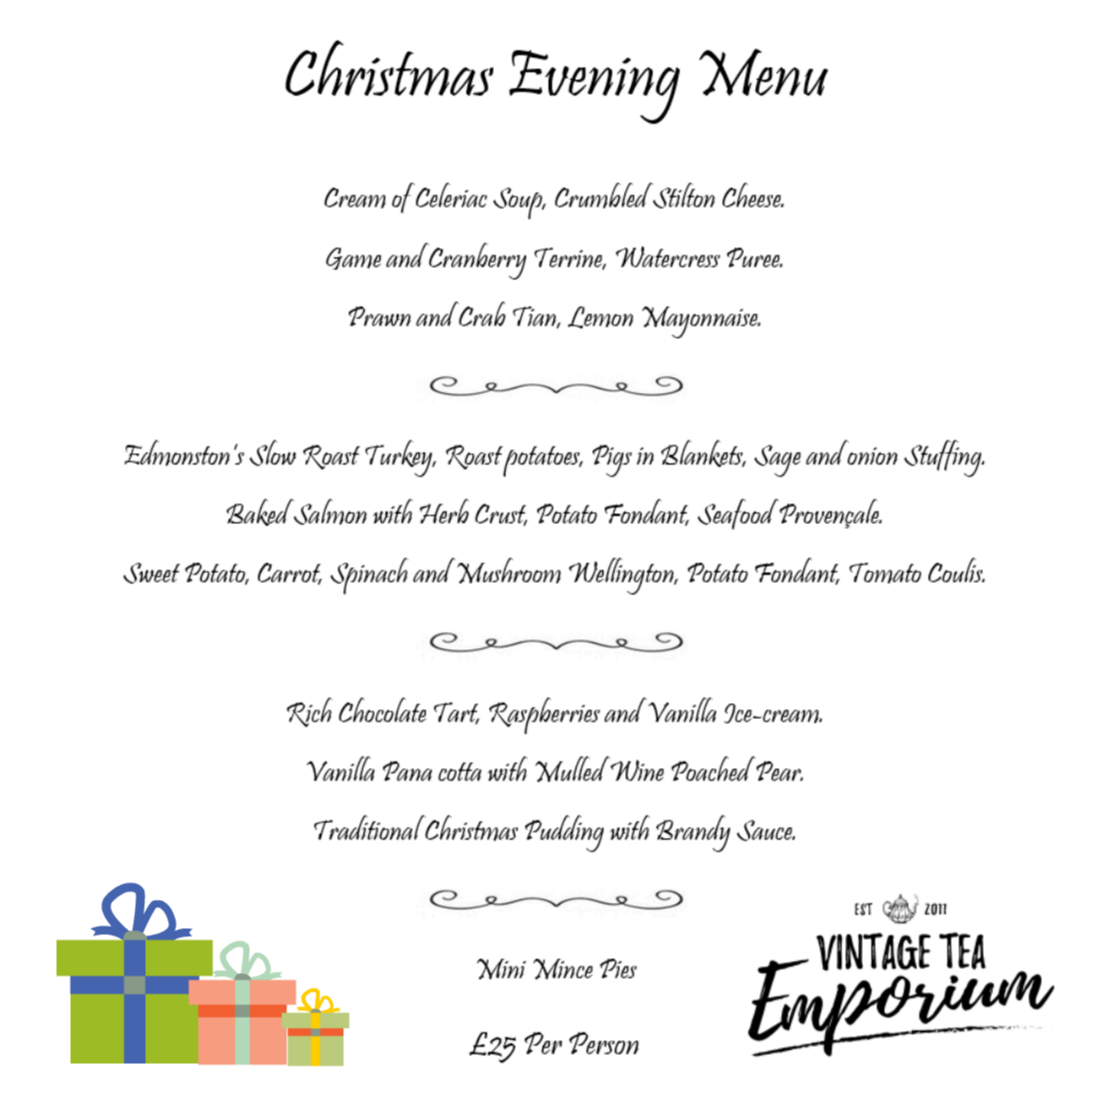 Vintage Tea Emporium Christmas dinner party menu